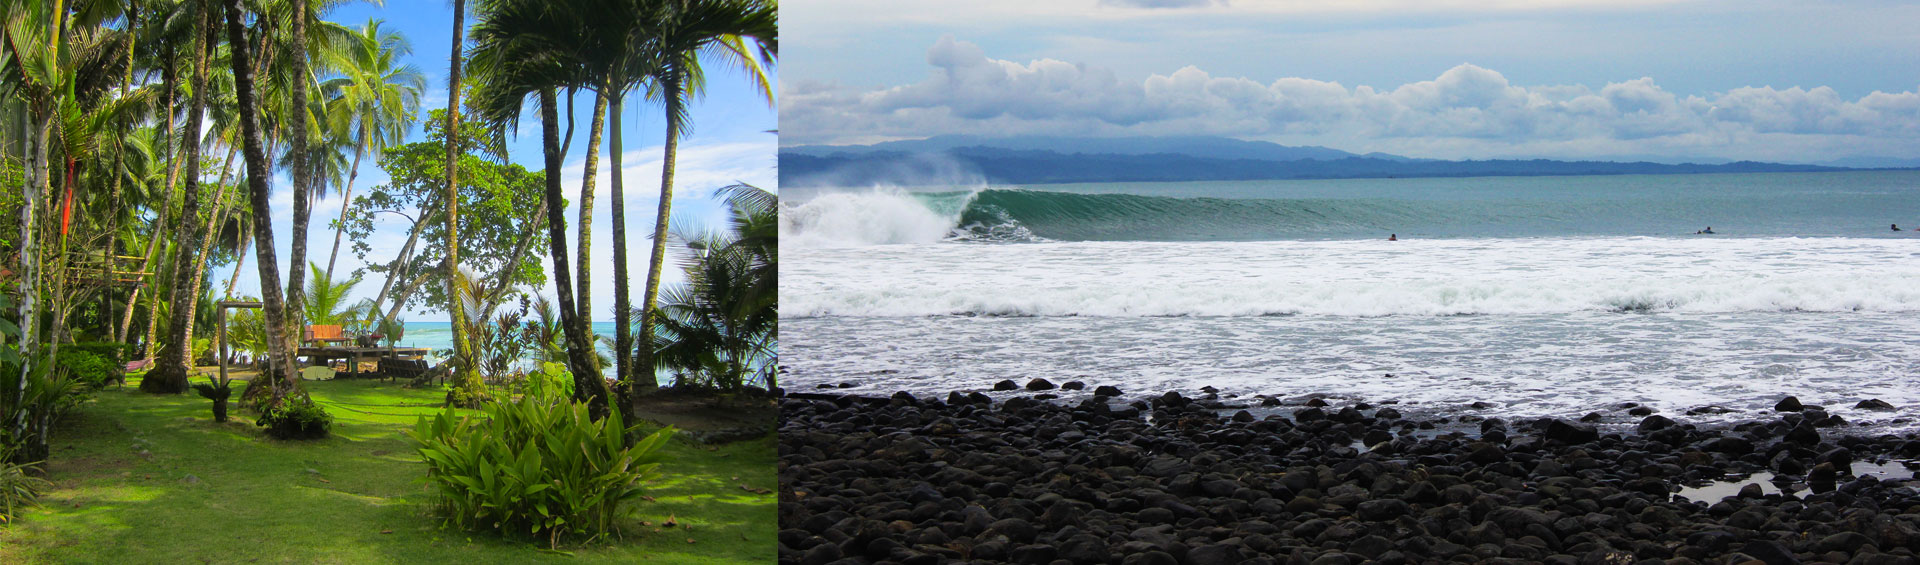 costa-rica-surf-camp